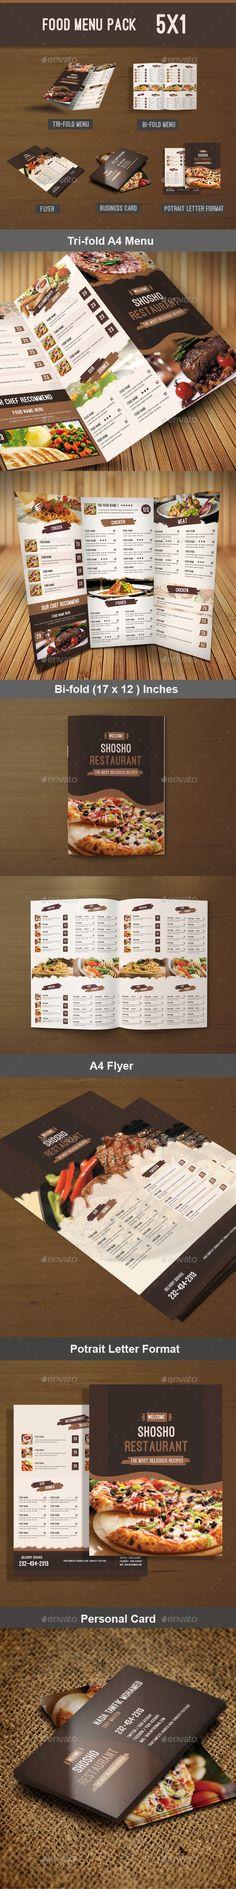 Food Menu Pack Template #design #print Download: http://graphicriver.net/item/food-menu-pack/12005905?ref=ksioks